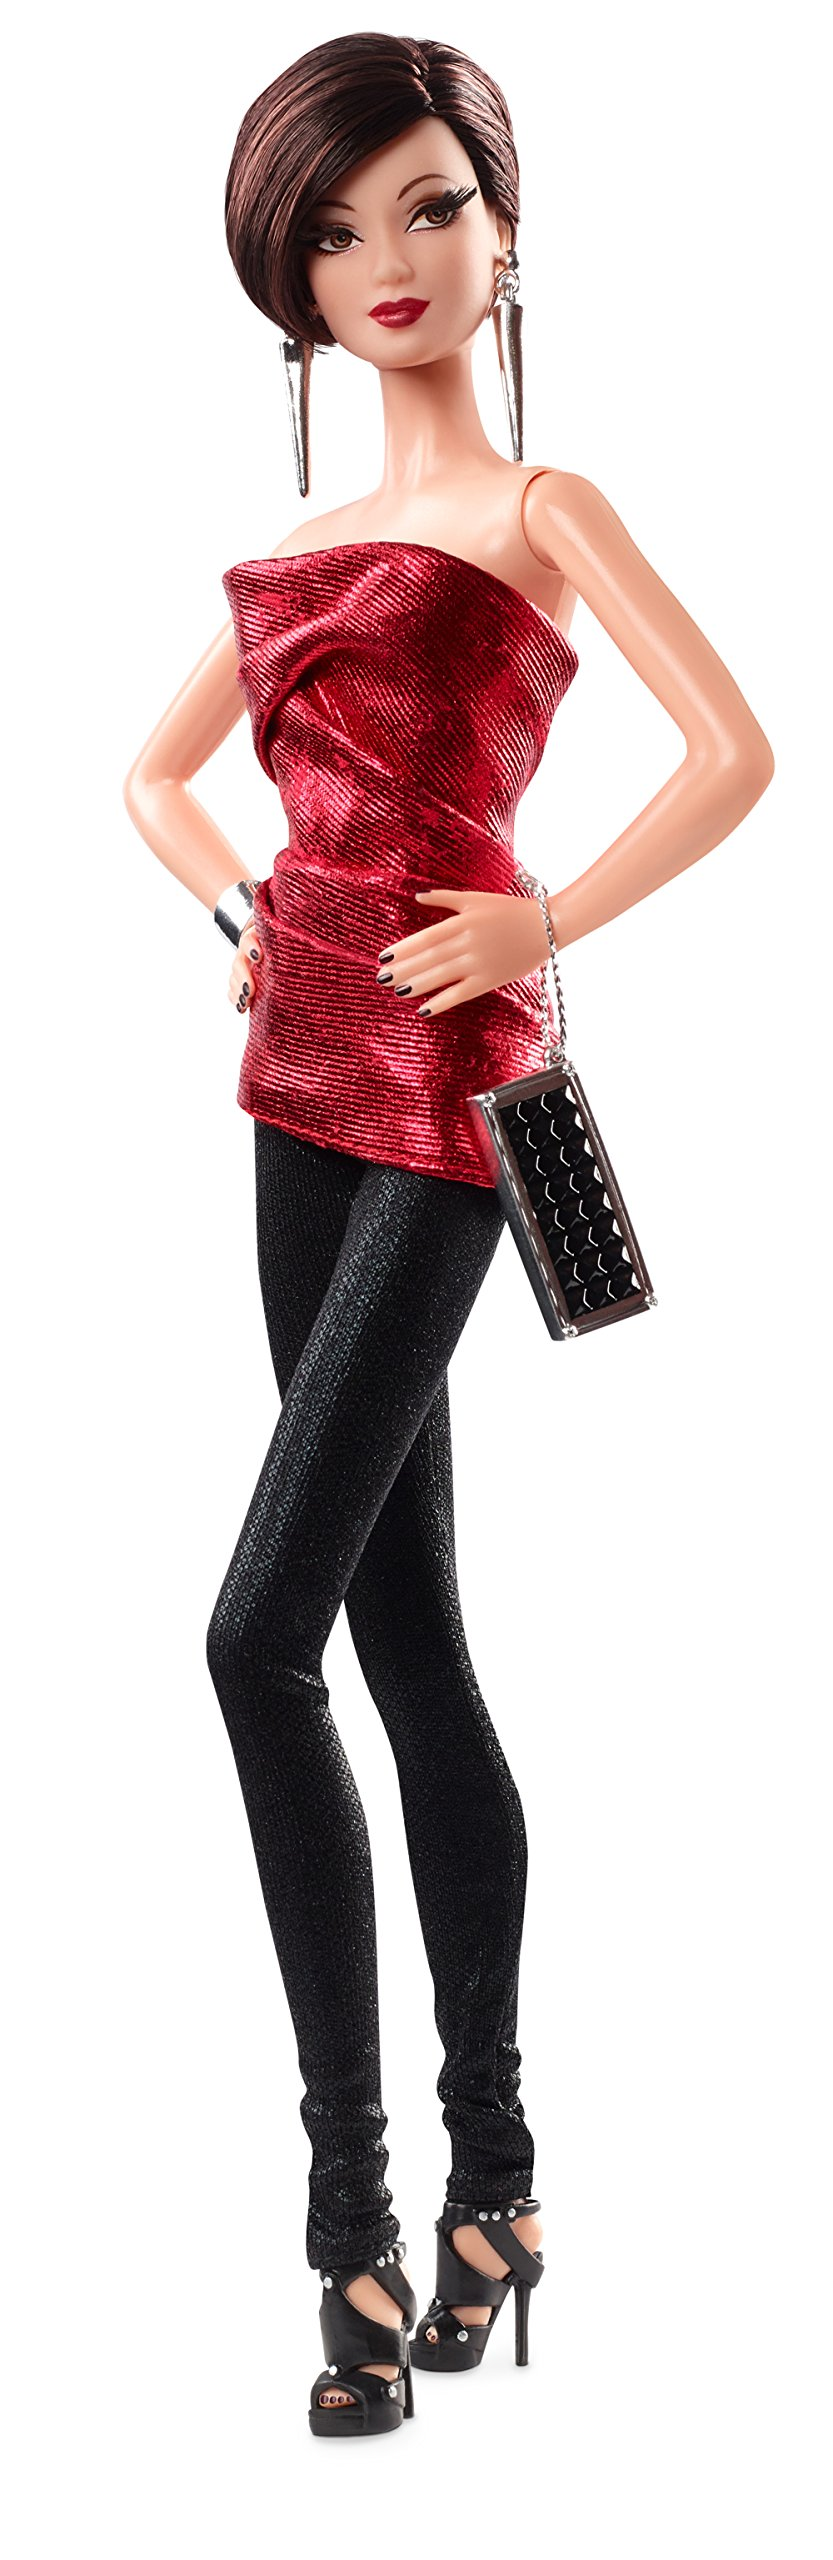 Barbie CJF51 Barbie: The Look Brunette Doll